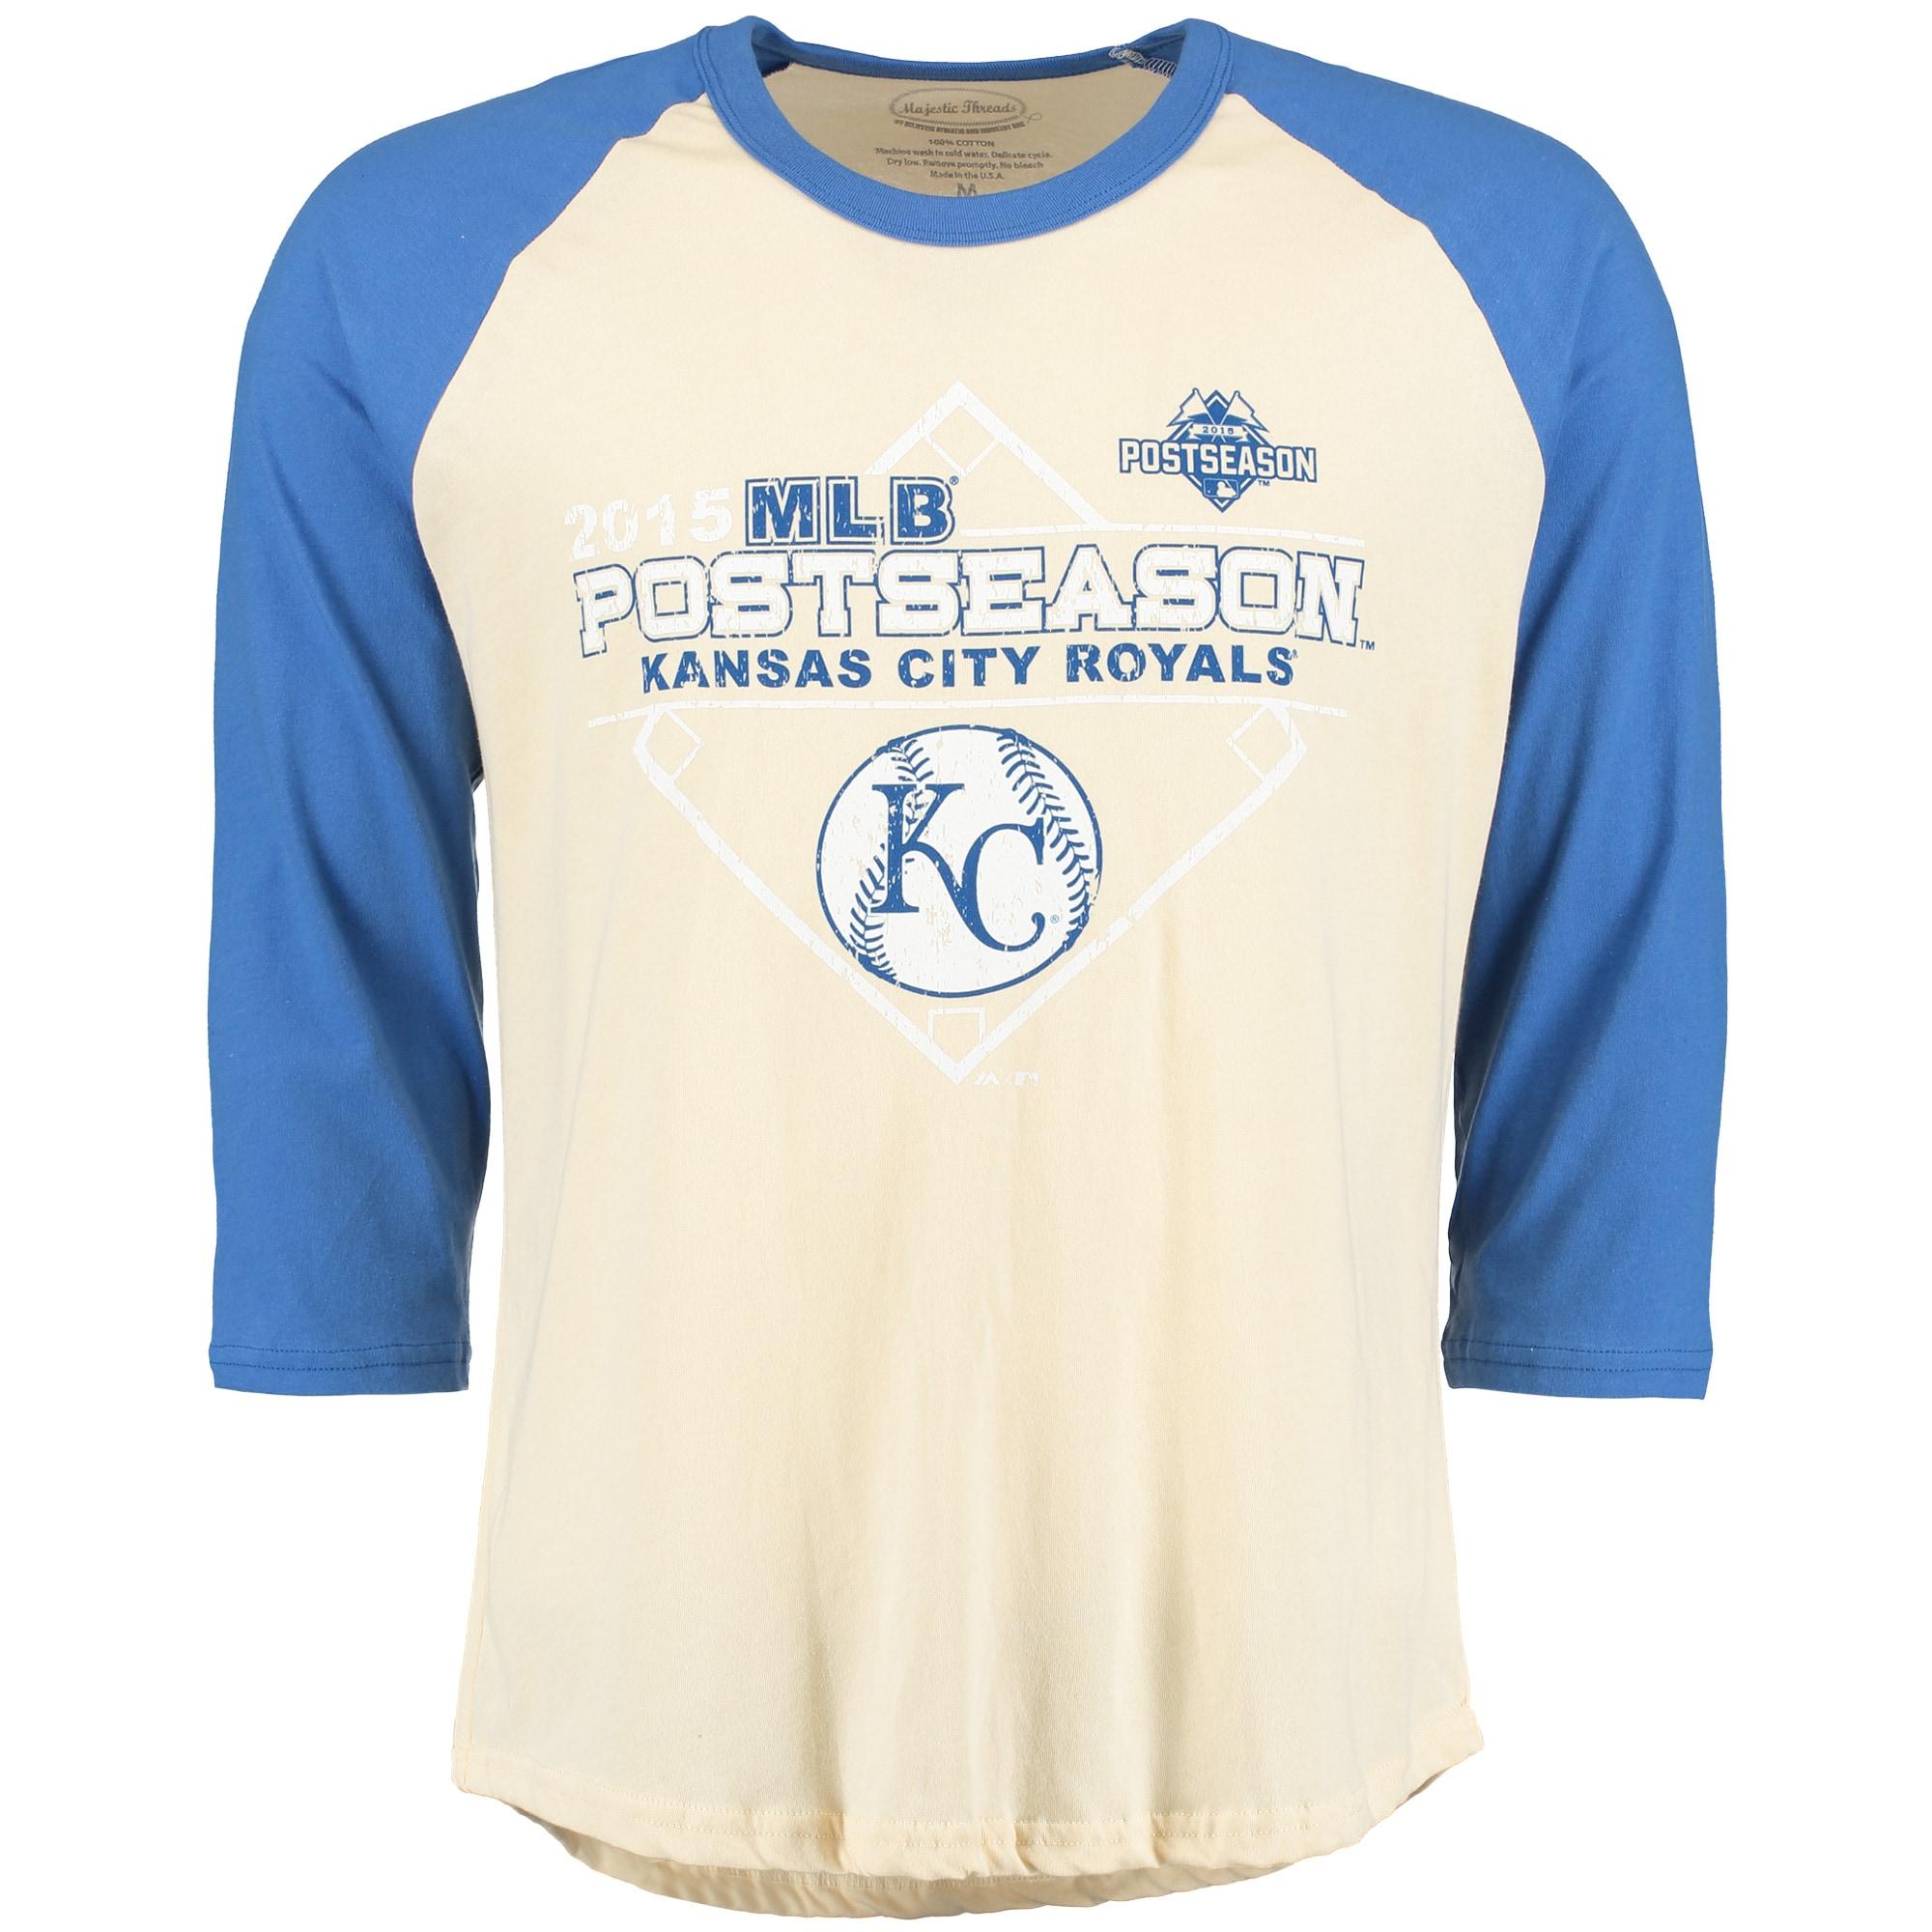 Kansas City Royals Majestic Threads 2015 Postseason Baseball Premium Raglan - Royal